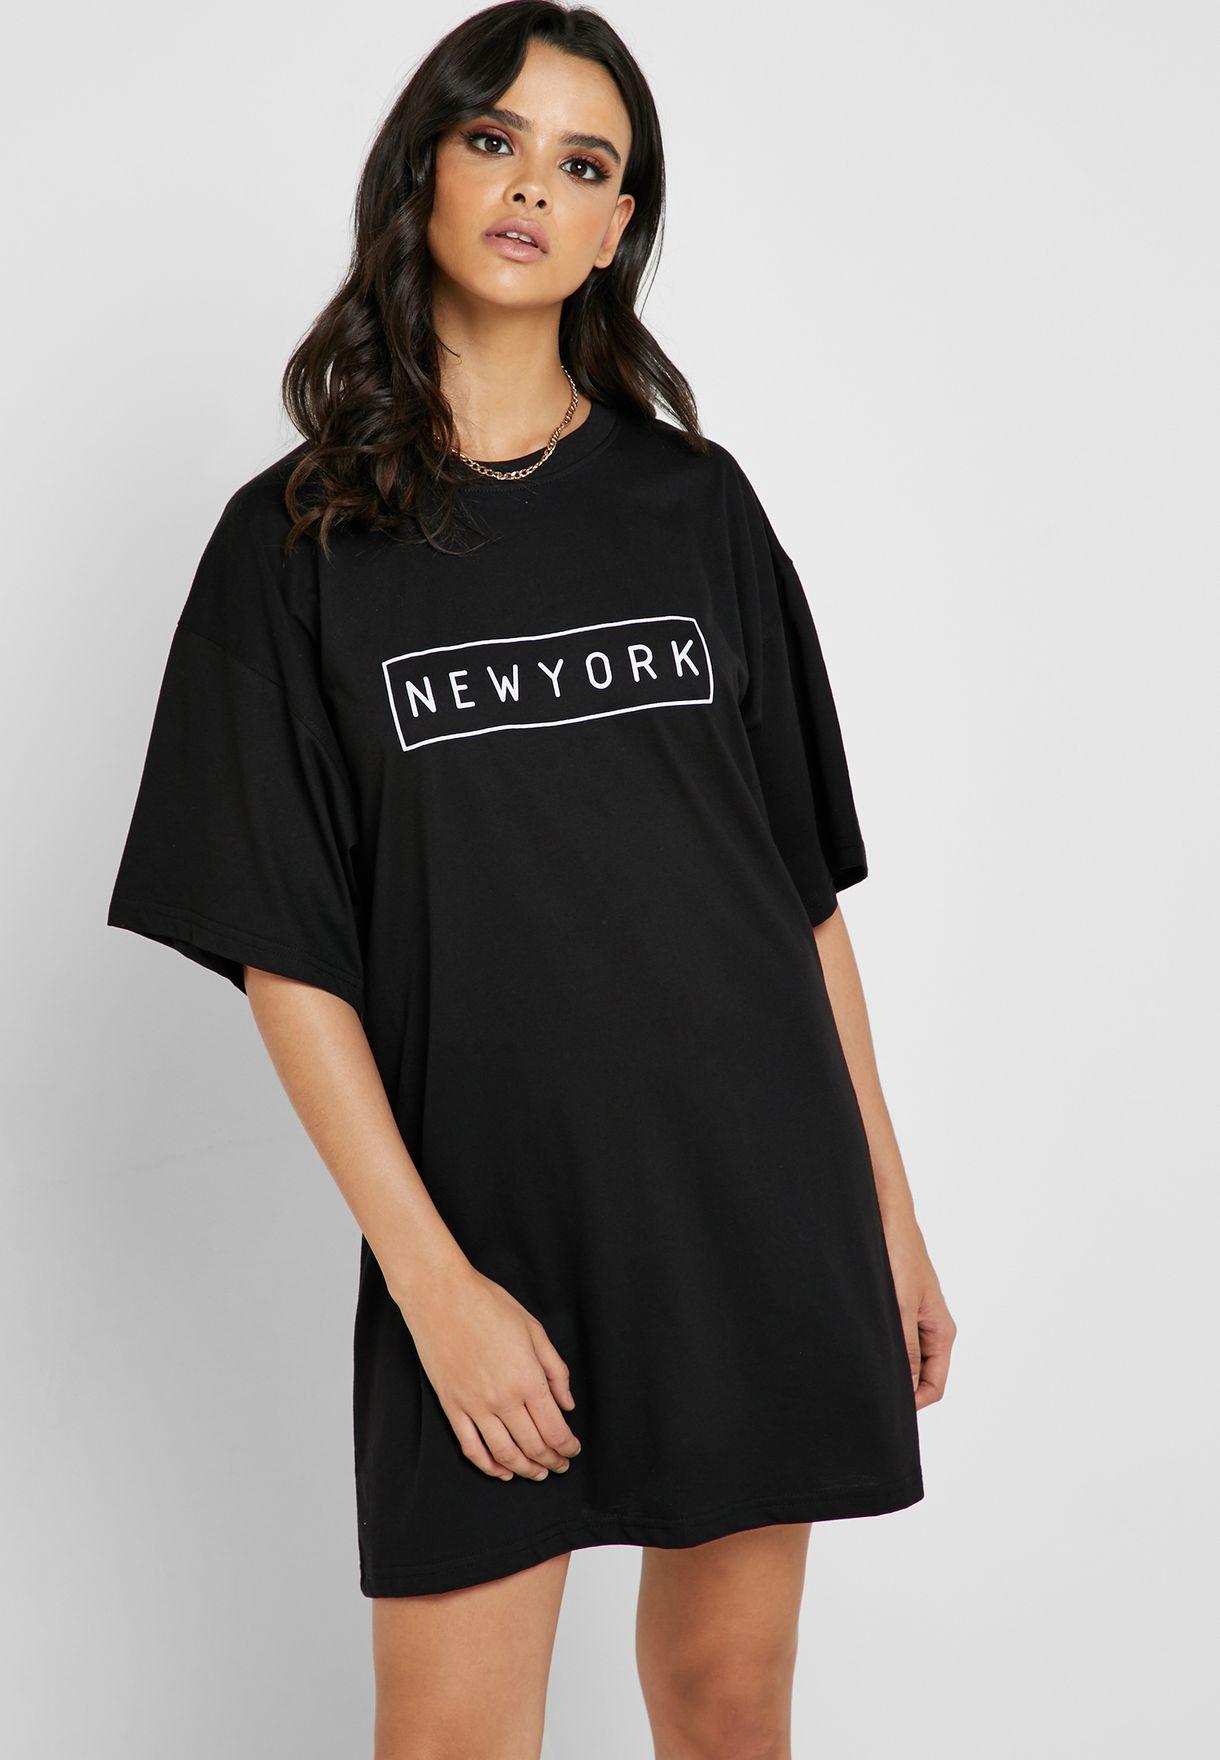 4948e5e6a5b1 Shop Missguided black Slogan Oversized T-Shirt Dress DD919168 for ...